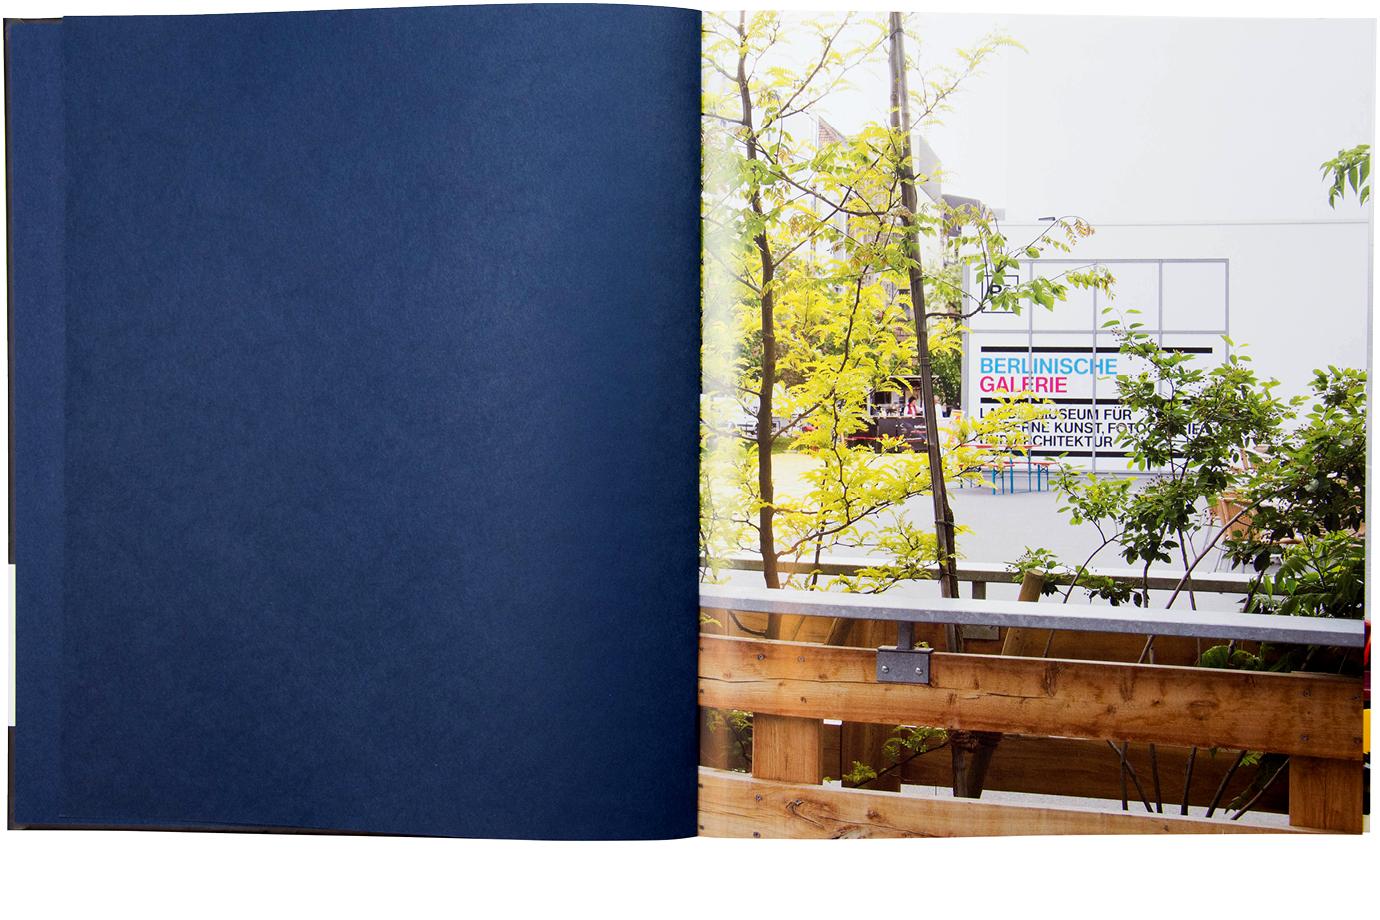 http://e-o-t.de/wordpress/wp-content/uploads/2017/06/2015_eot-BG-Jubilaeum-Book-2.jpg